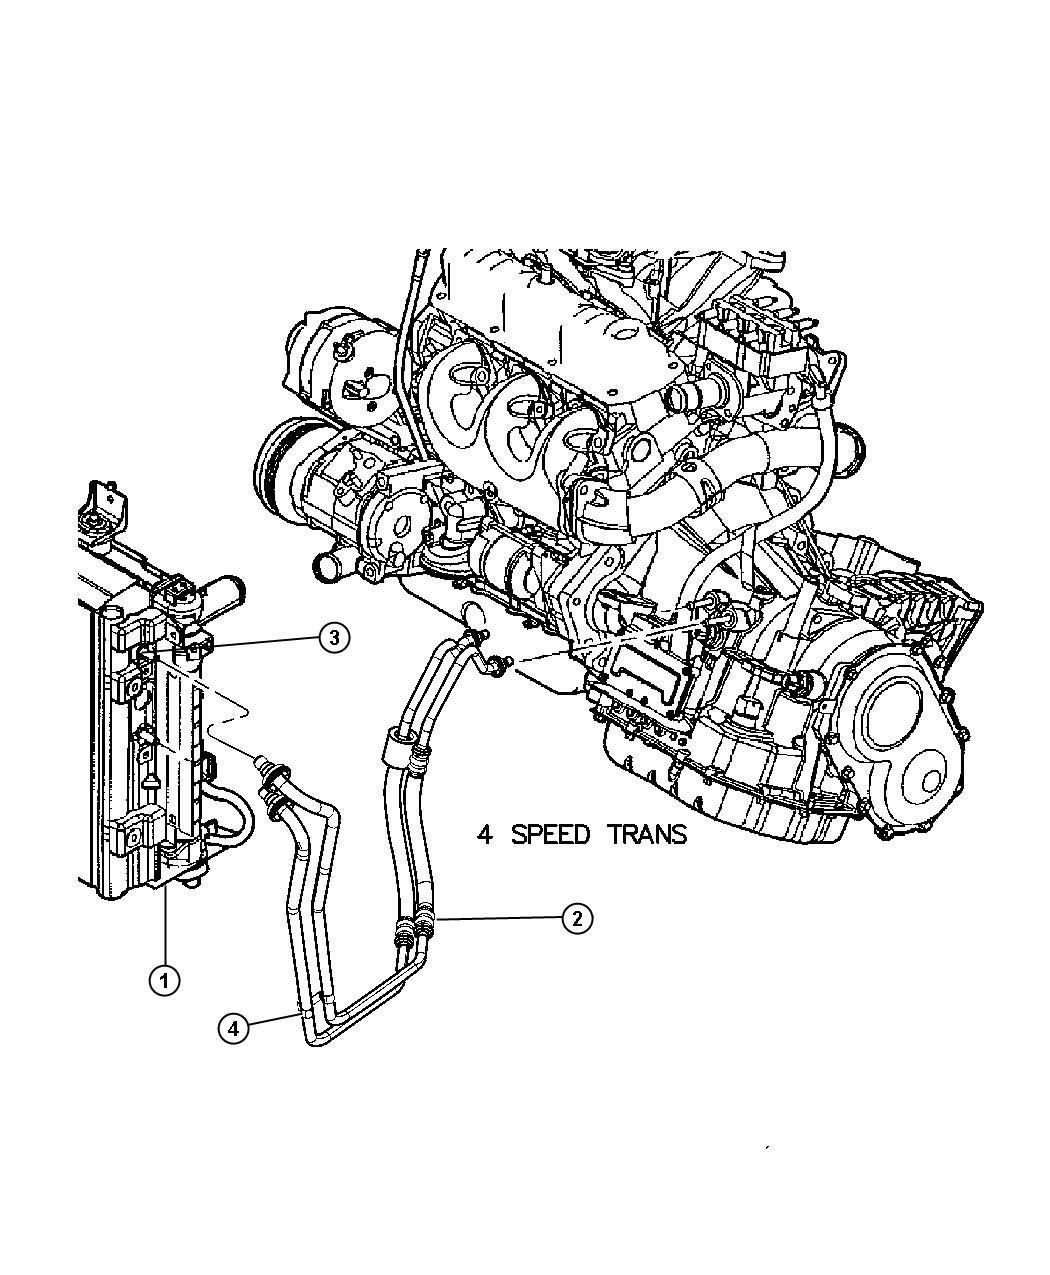 Transmission Oil Cooler And Lines